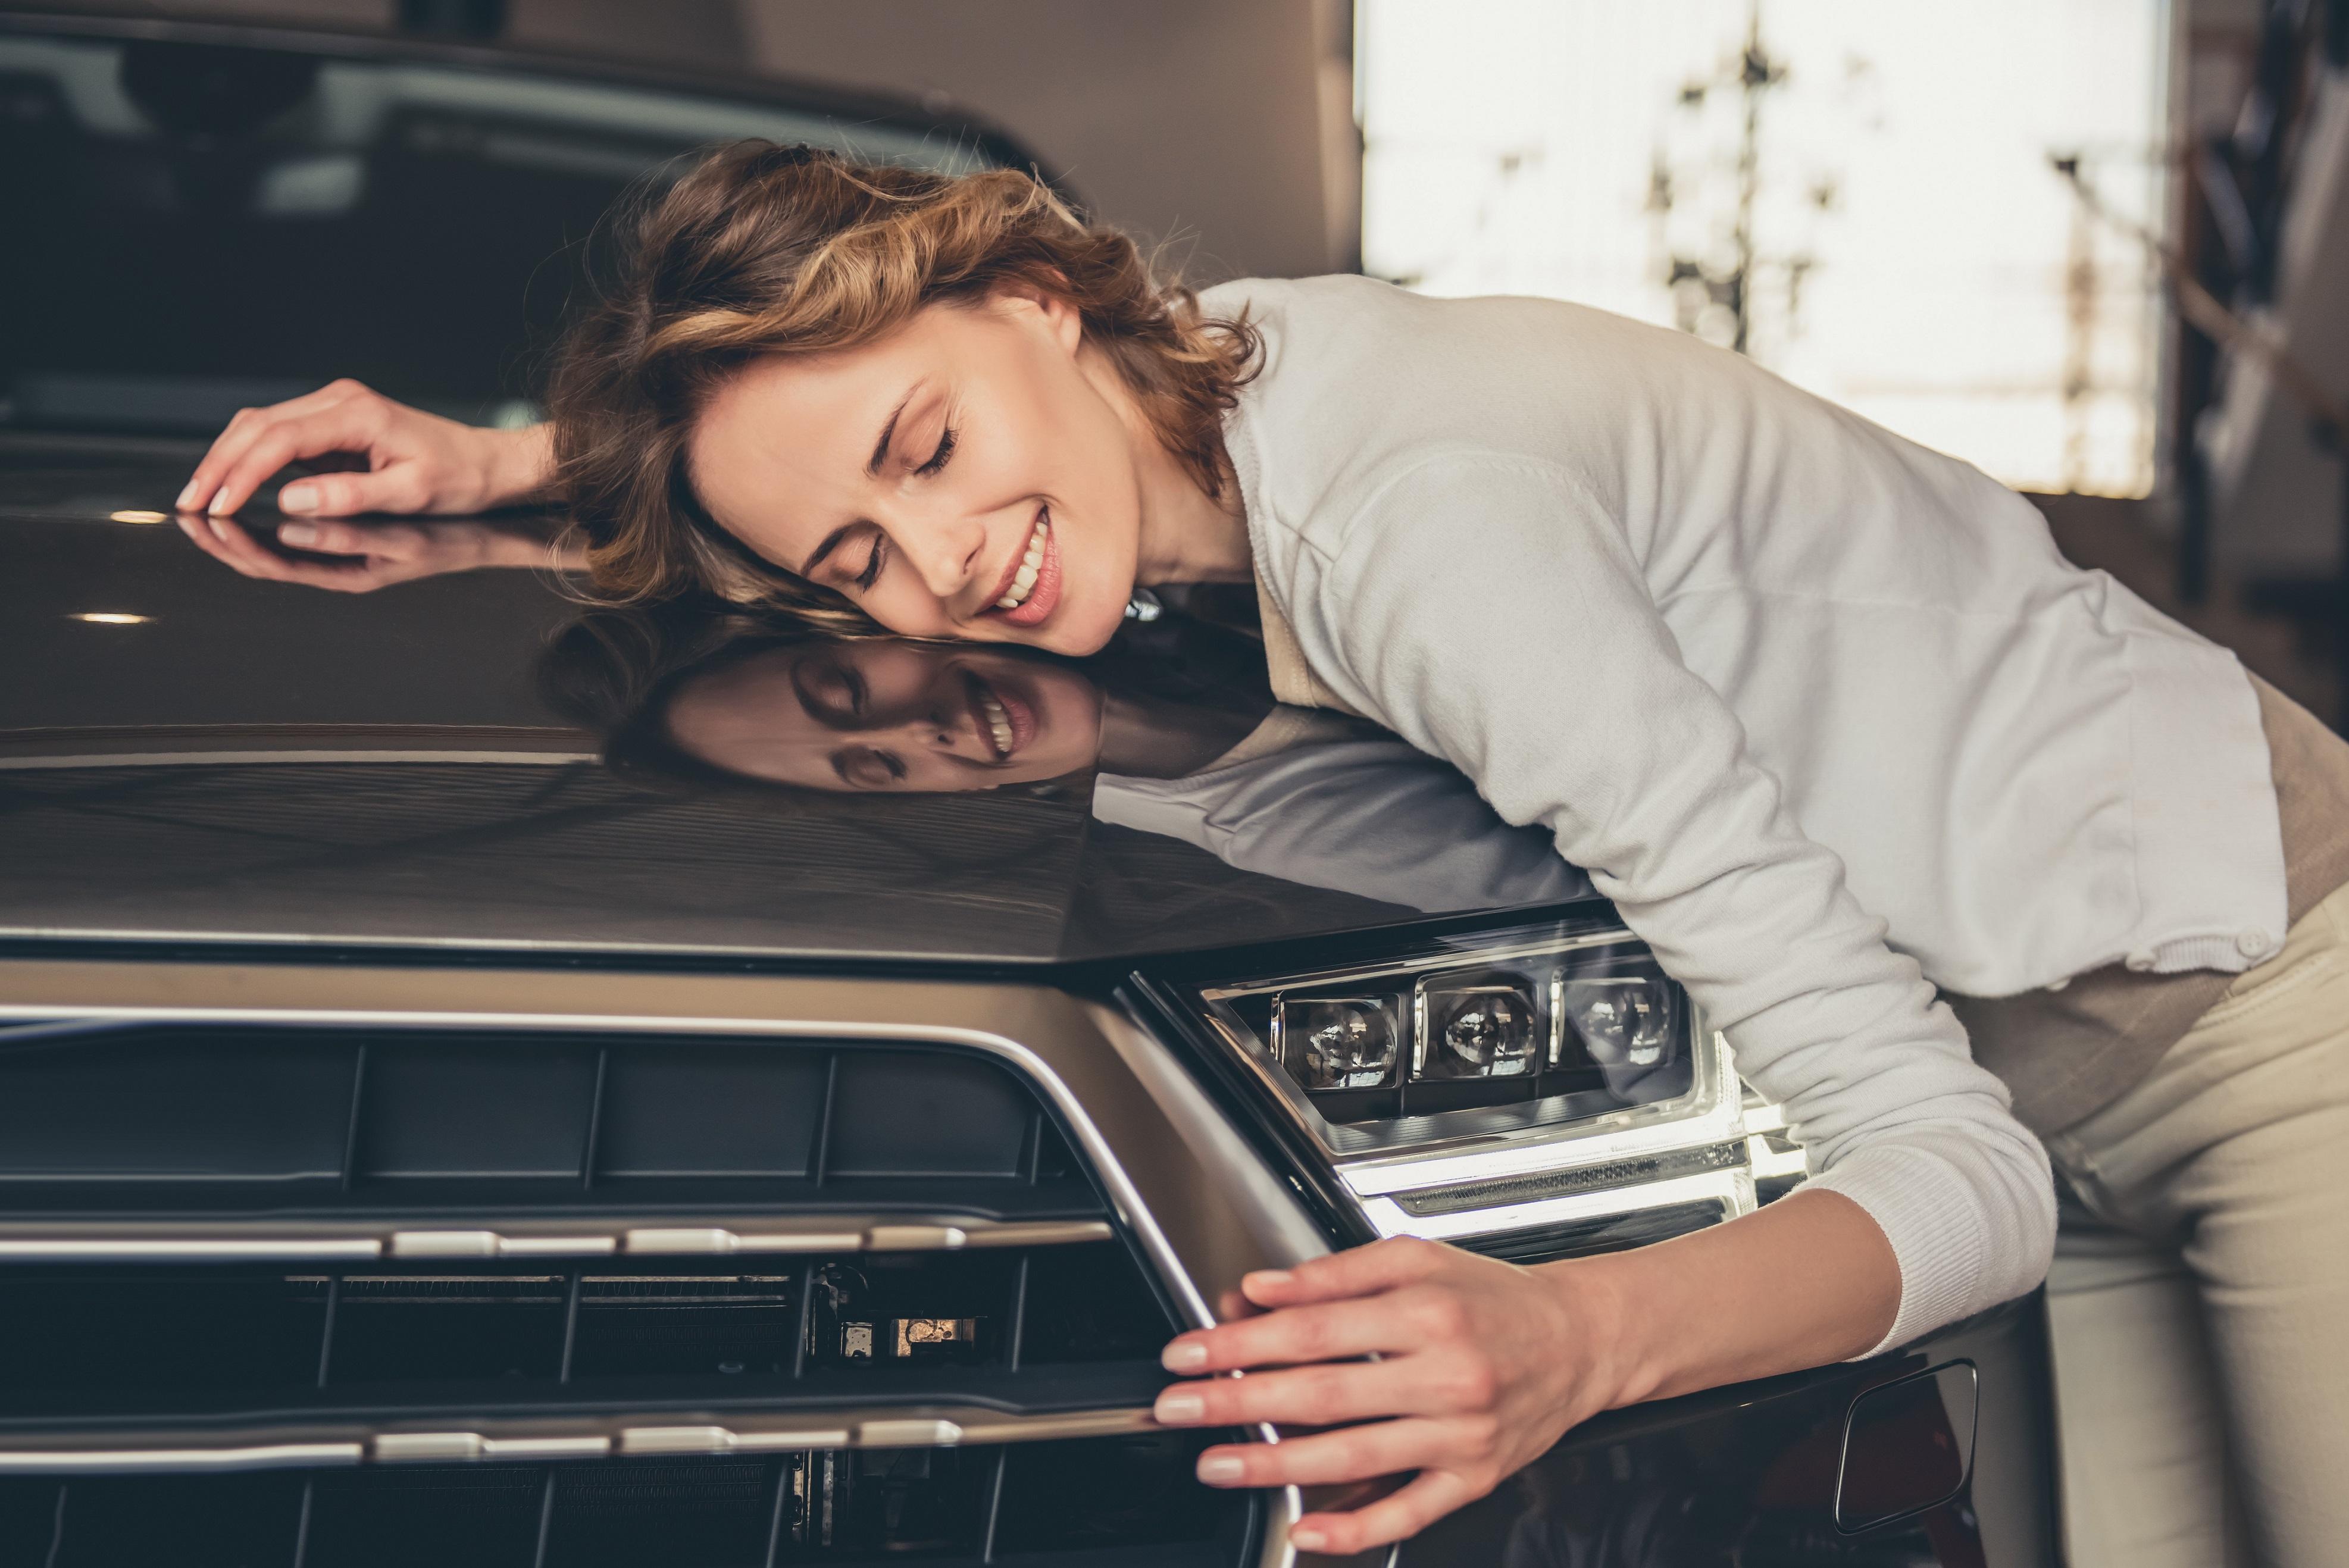 Young woman hugging car